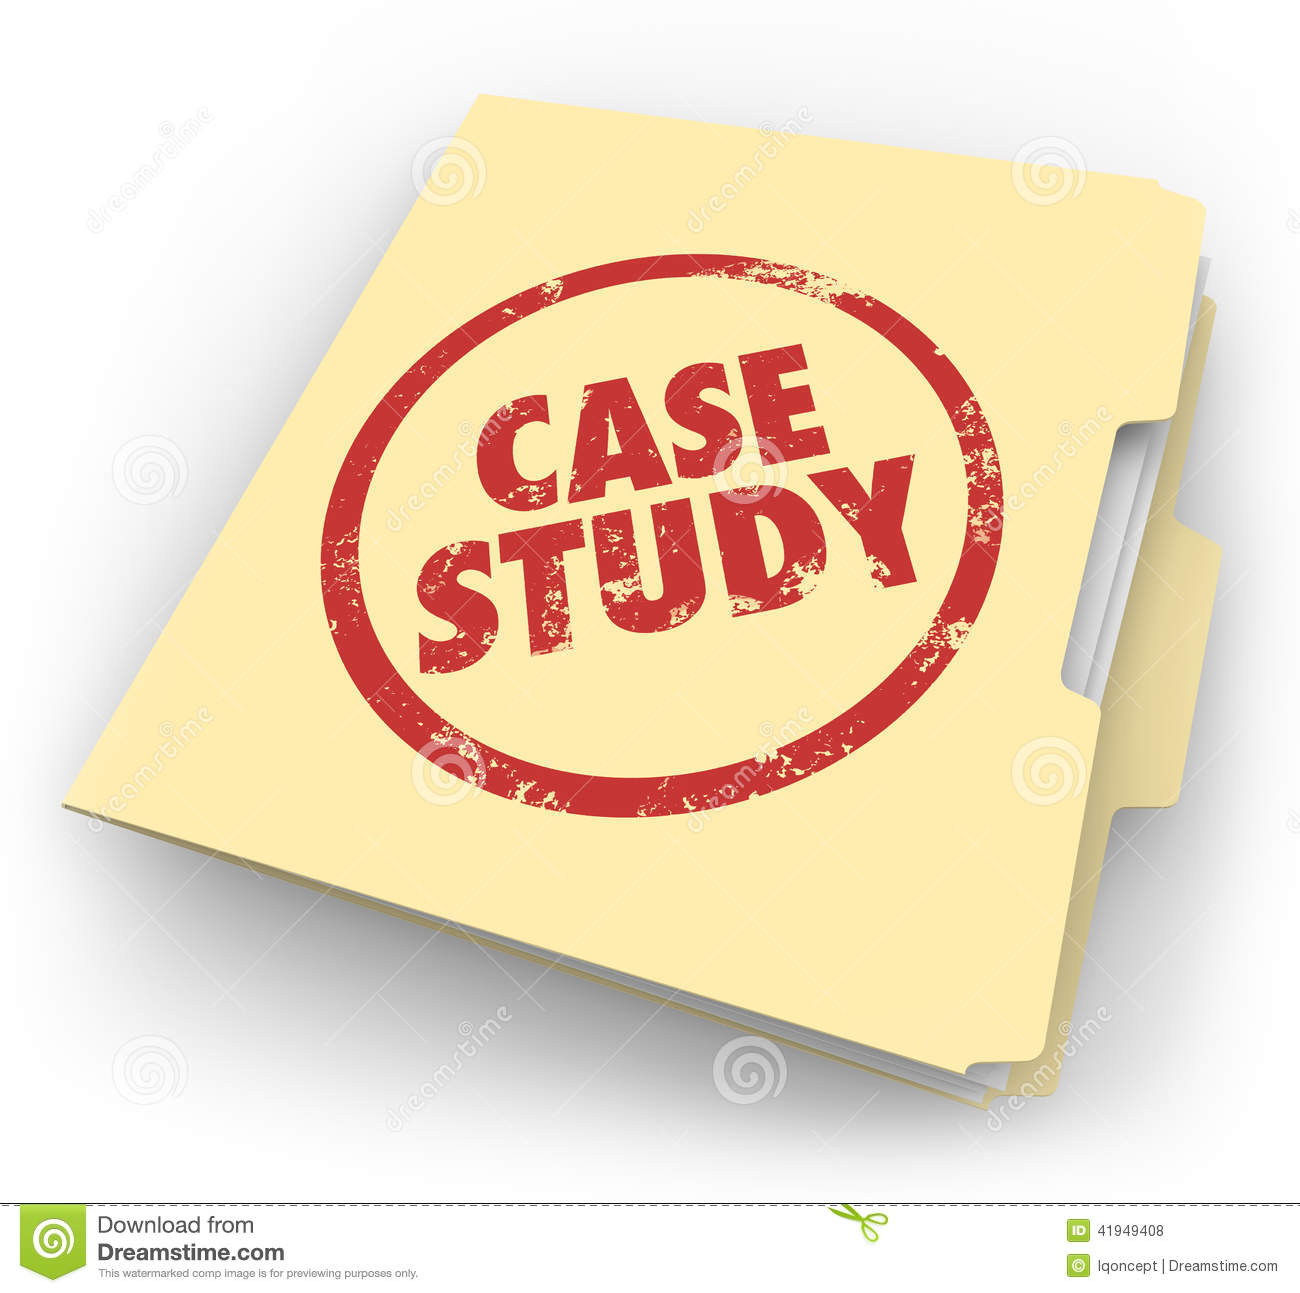 Case study clipart vector Case study clipart 10 » Clipart Station vector